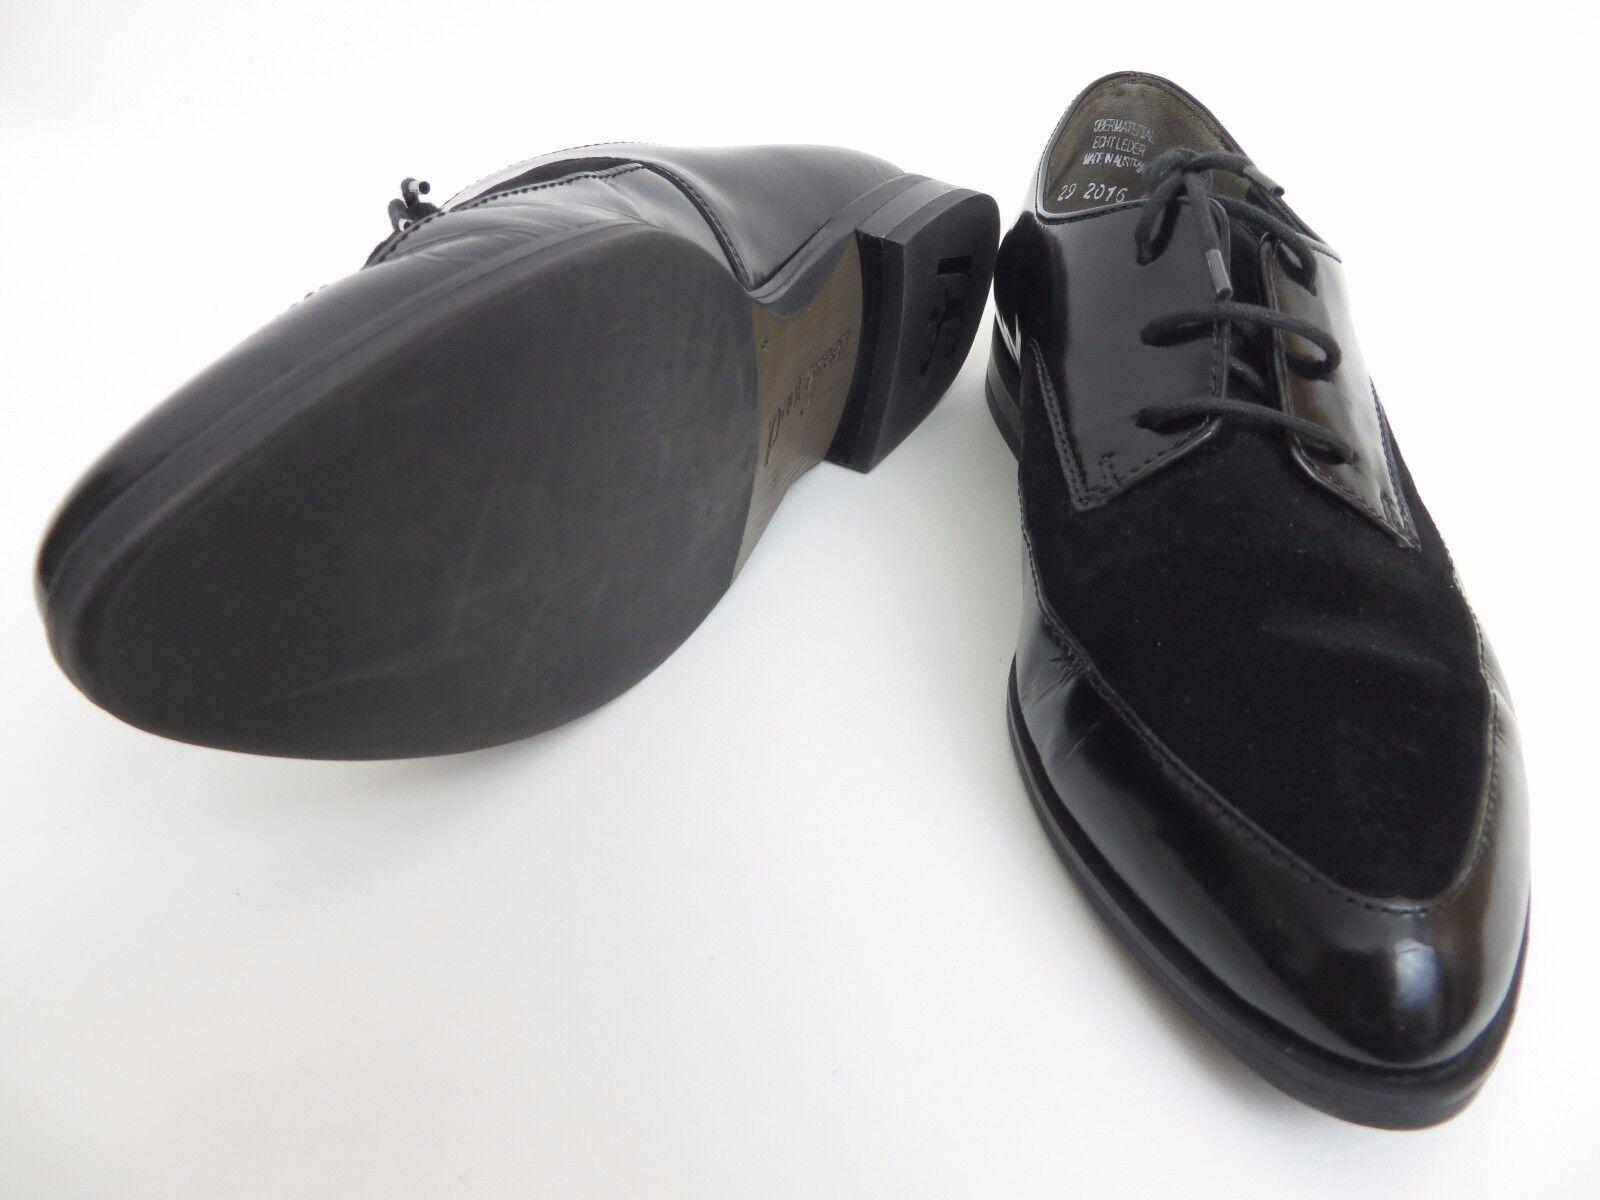 PAUL vert CACHE noir COMBO COMBO COMBO LEATHER SUEDE 1641 Taille 6.5 MSRP   299 DON'T MISSIT 23dc6f